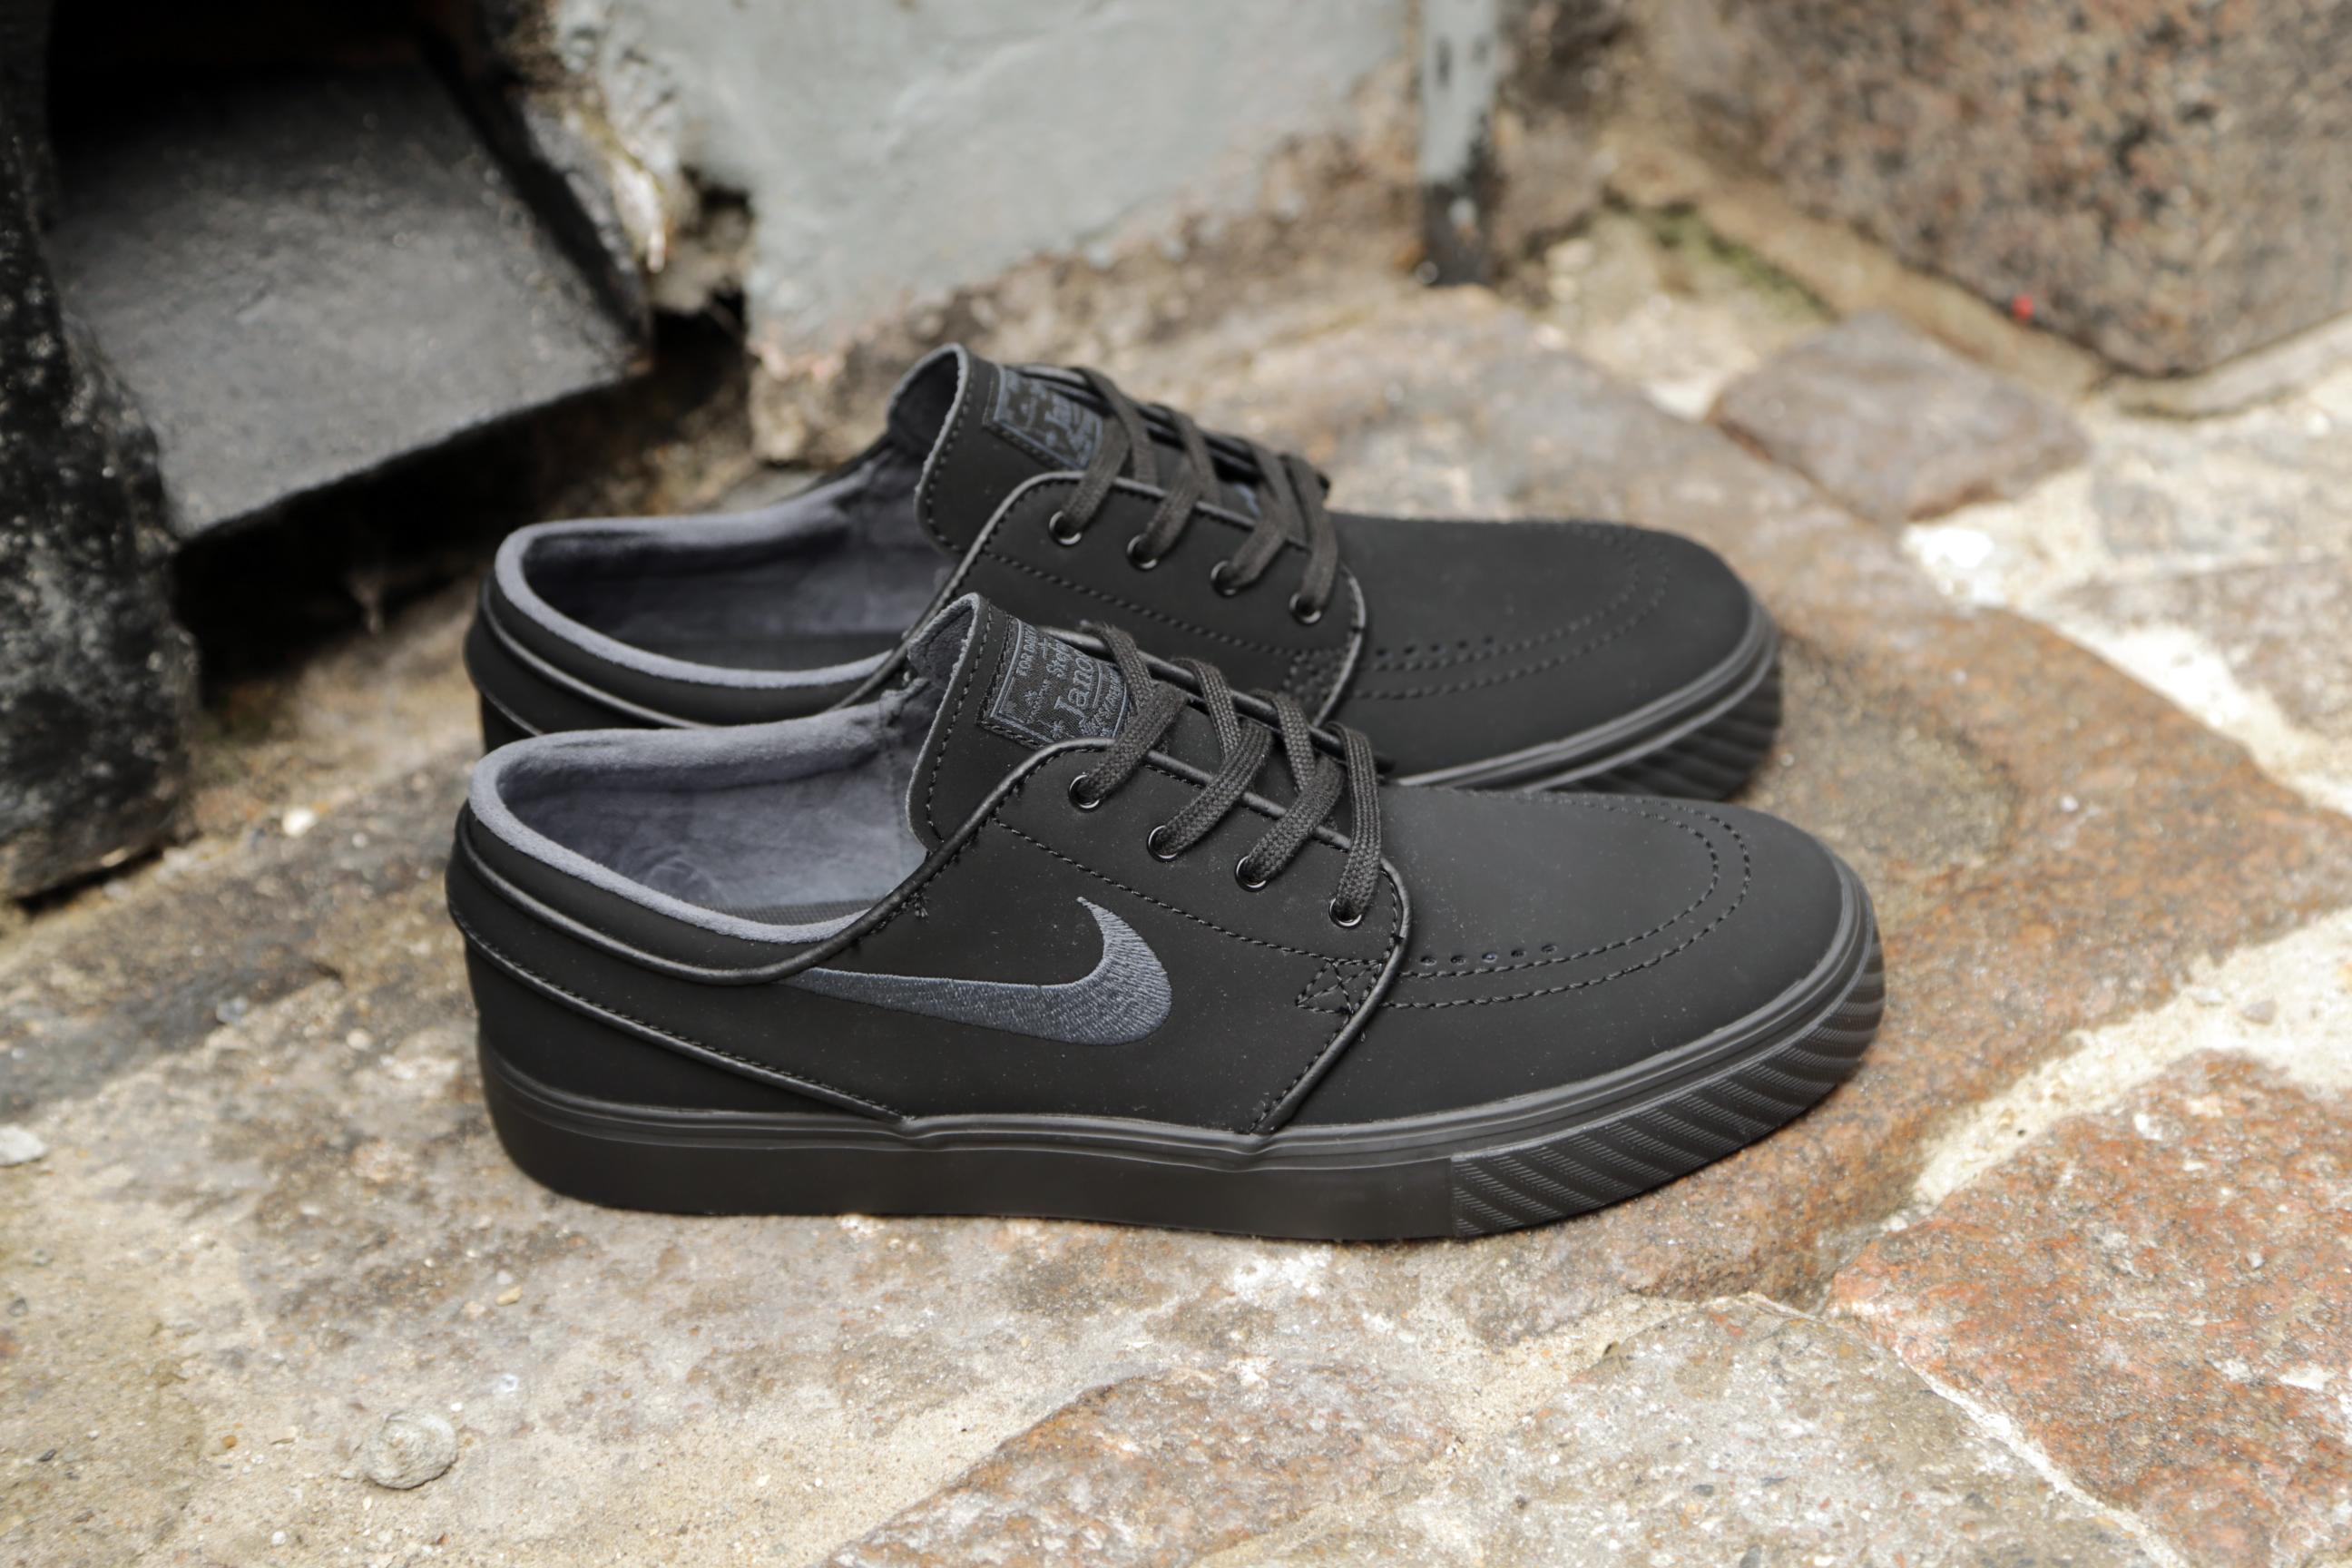 29b2f62c2 Nike SB Zoom Stefan Janoski – Black   Anthracite – STASP